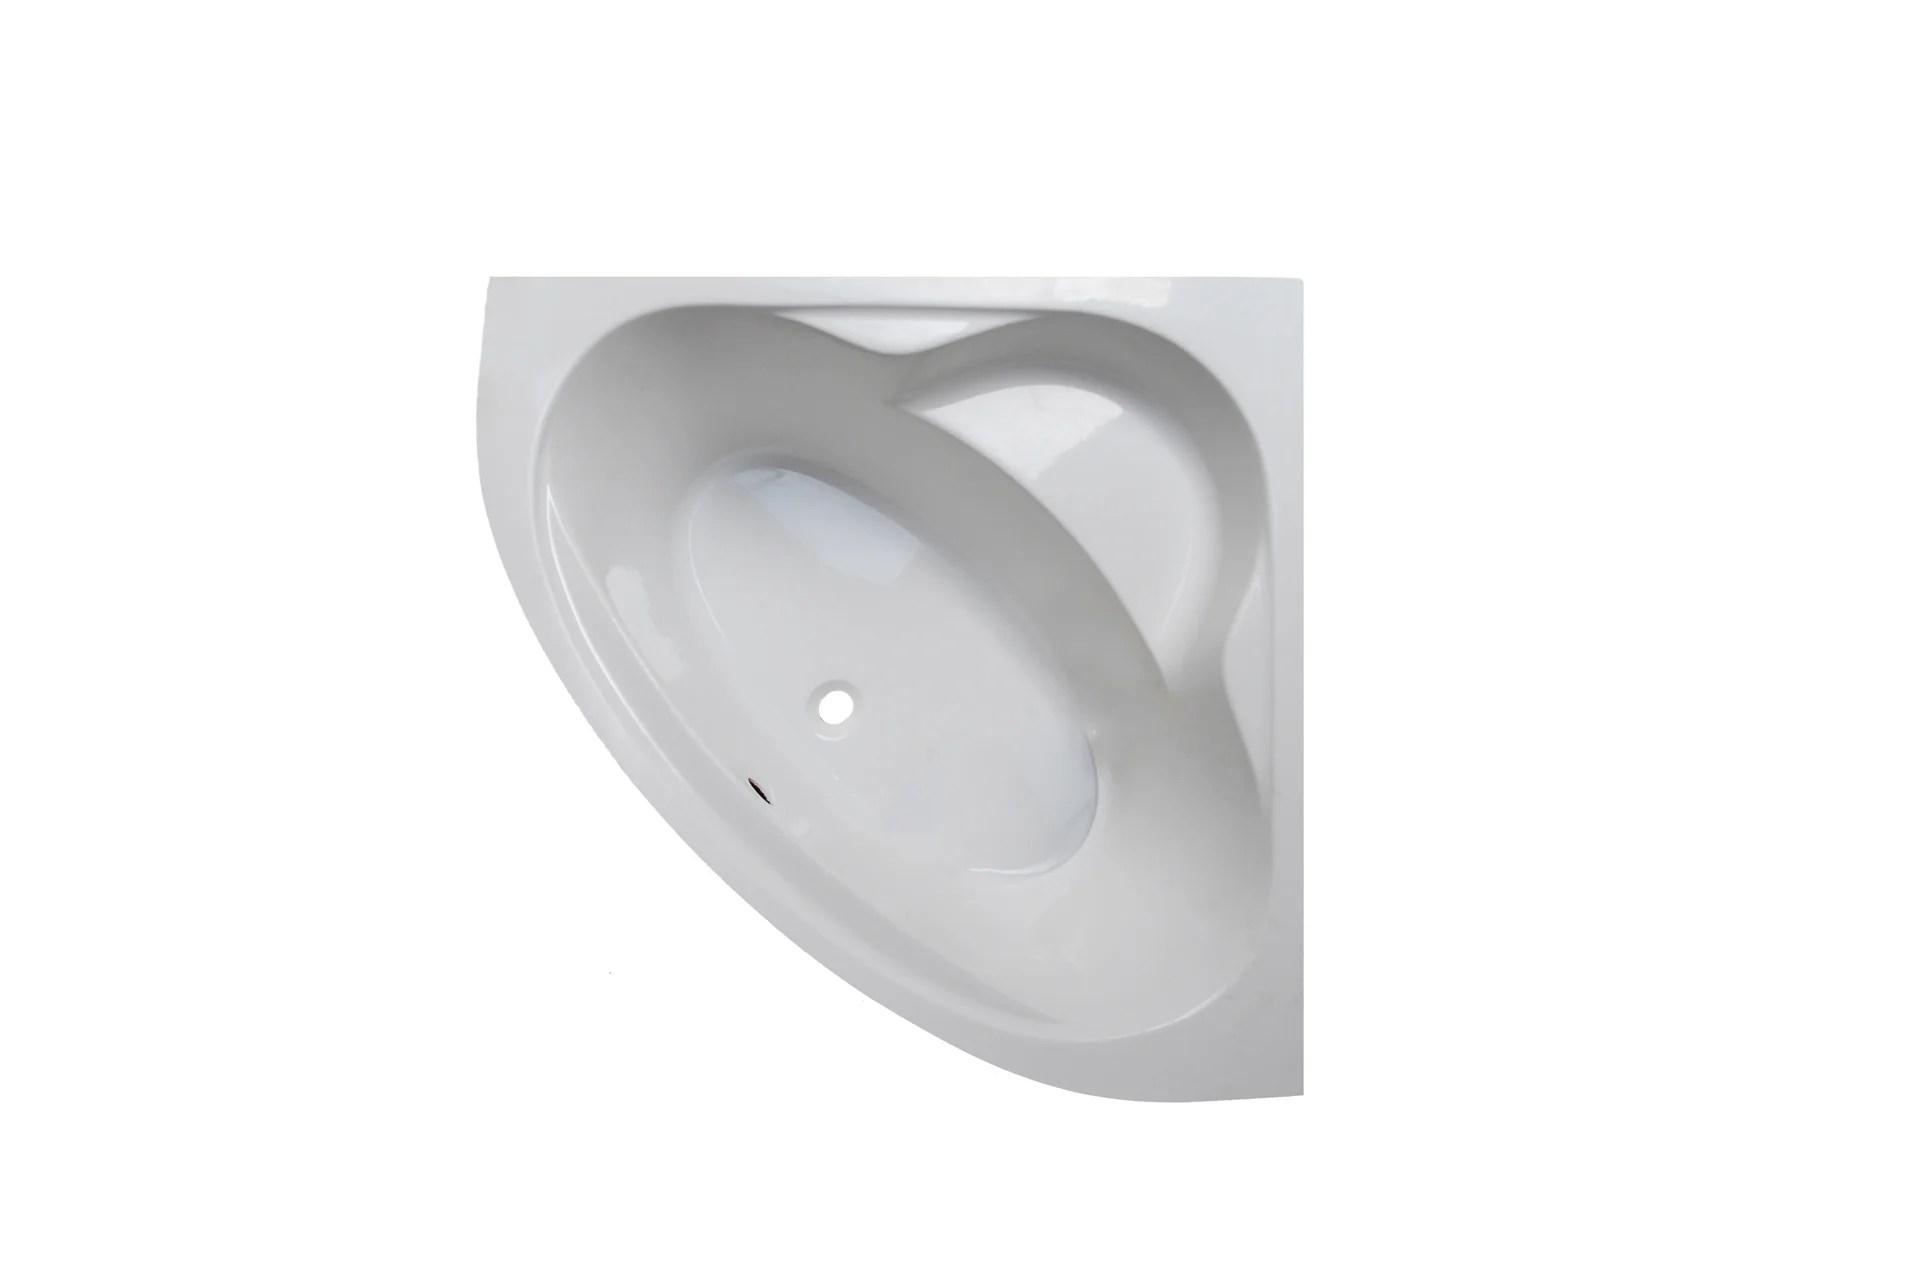 baignoire d angle l 130x l 130 cm blanc sensea access confort